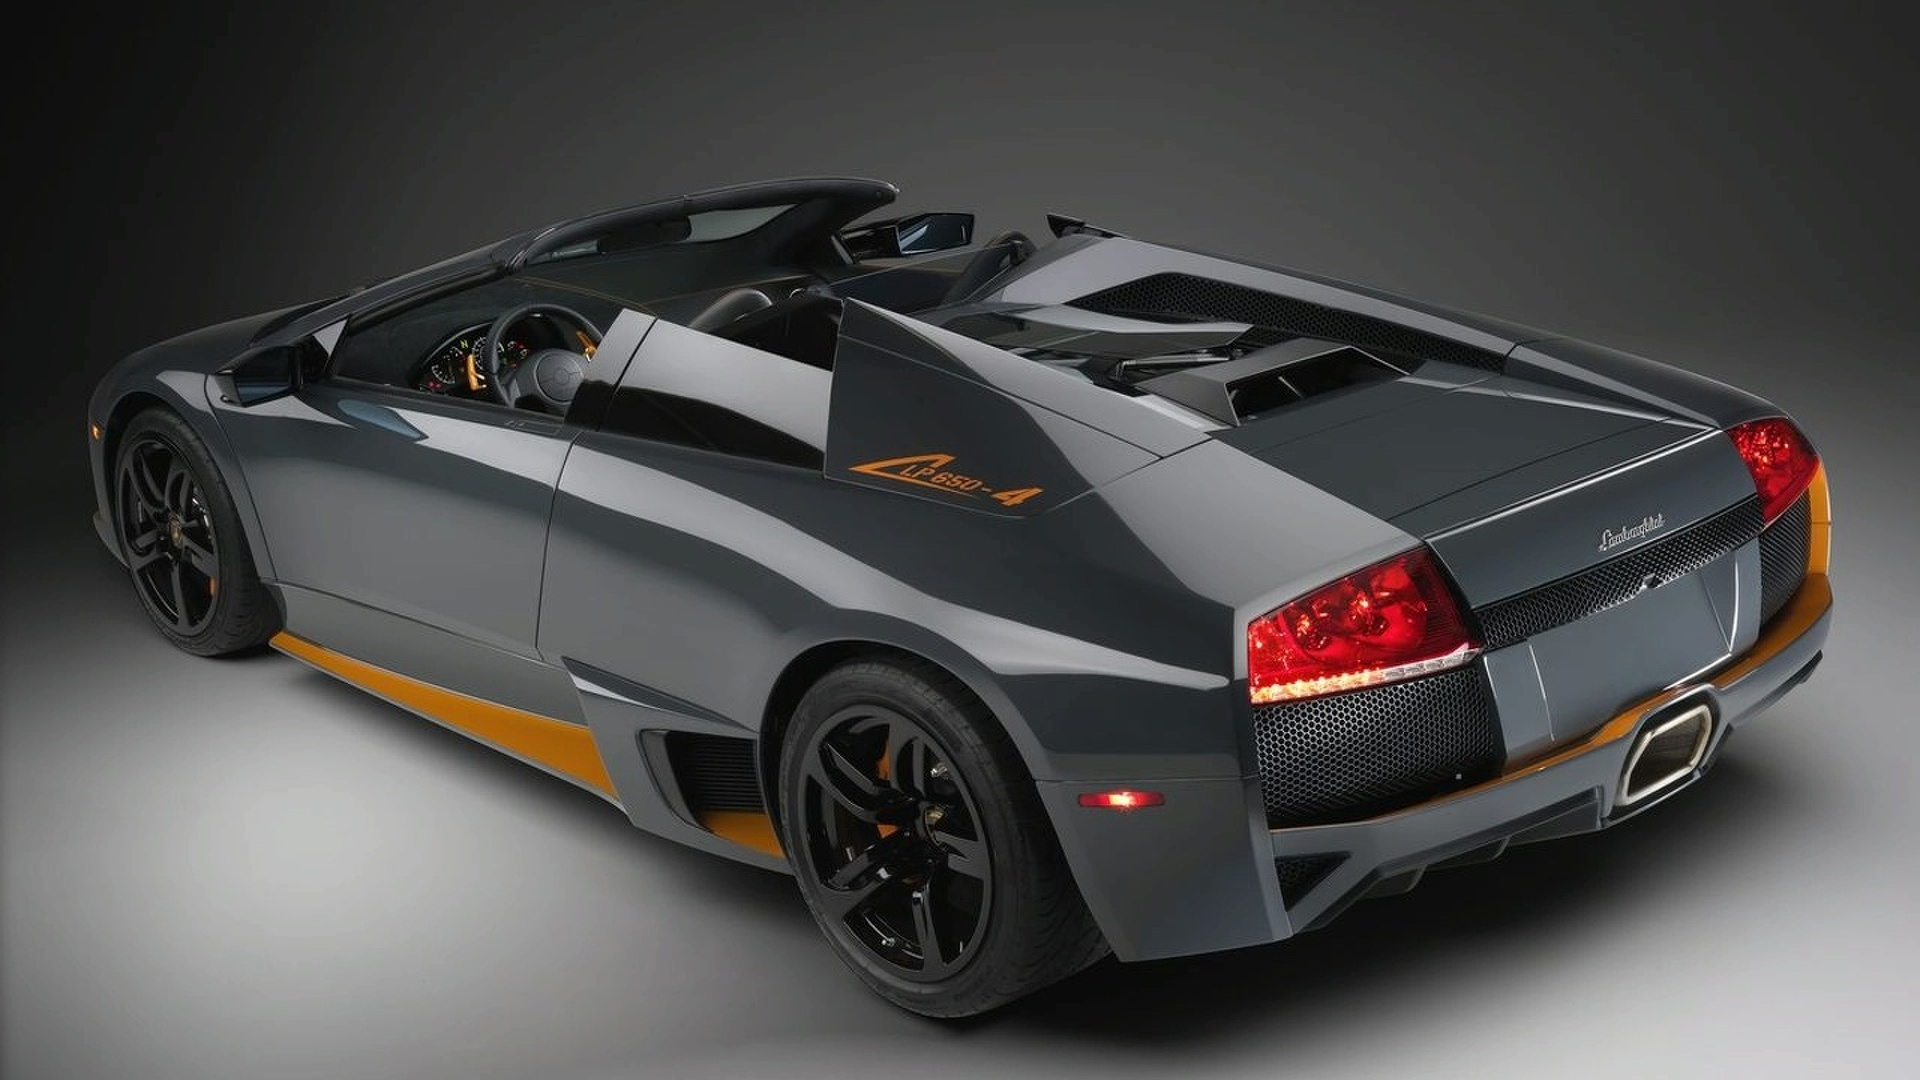 Lamborghini Murcielago Lp650 4 Roadster First Official Photos Released